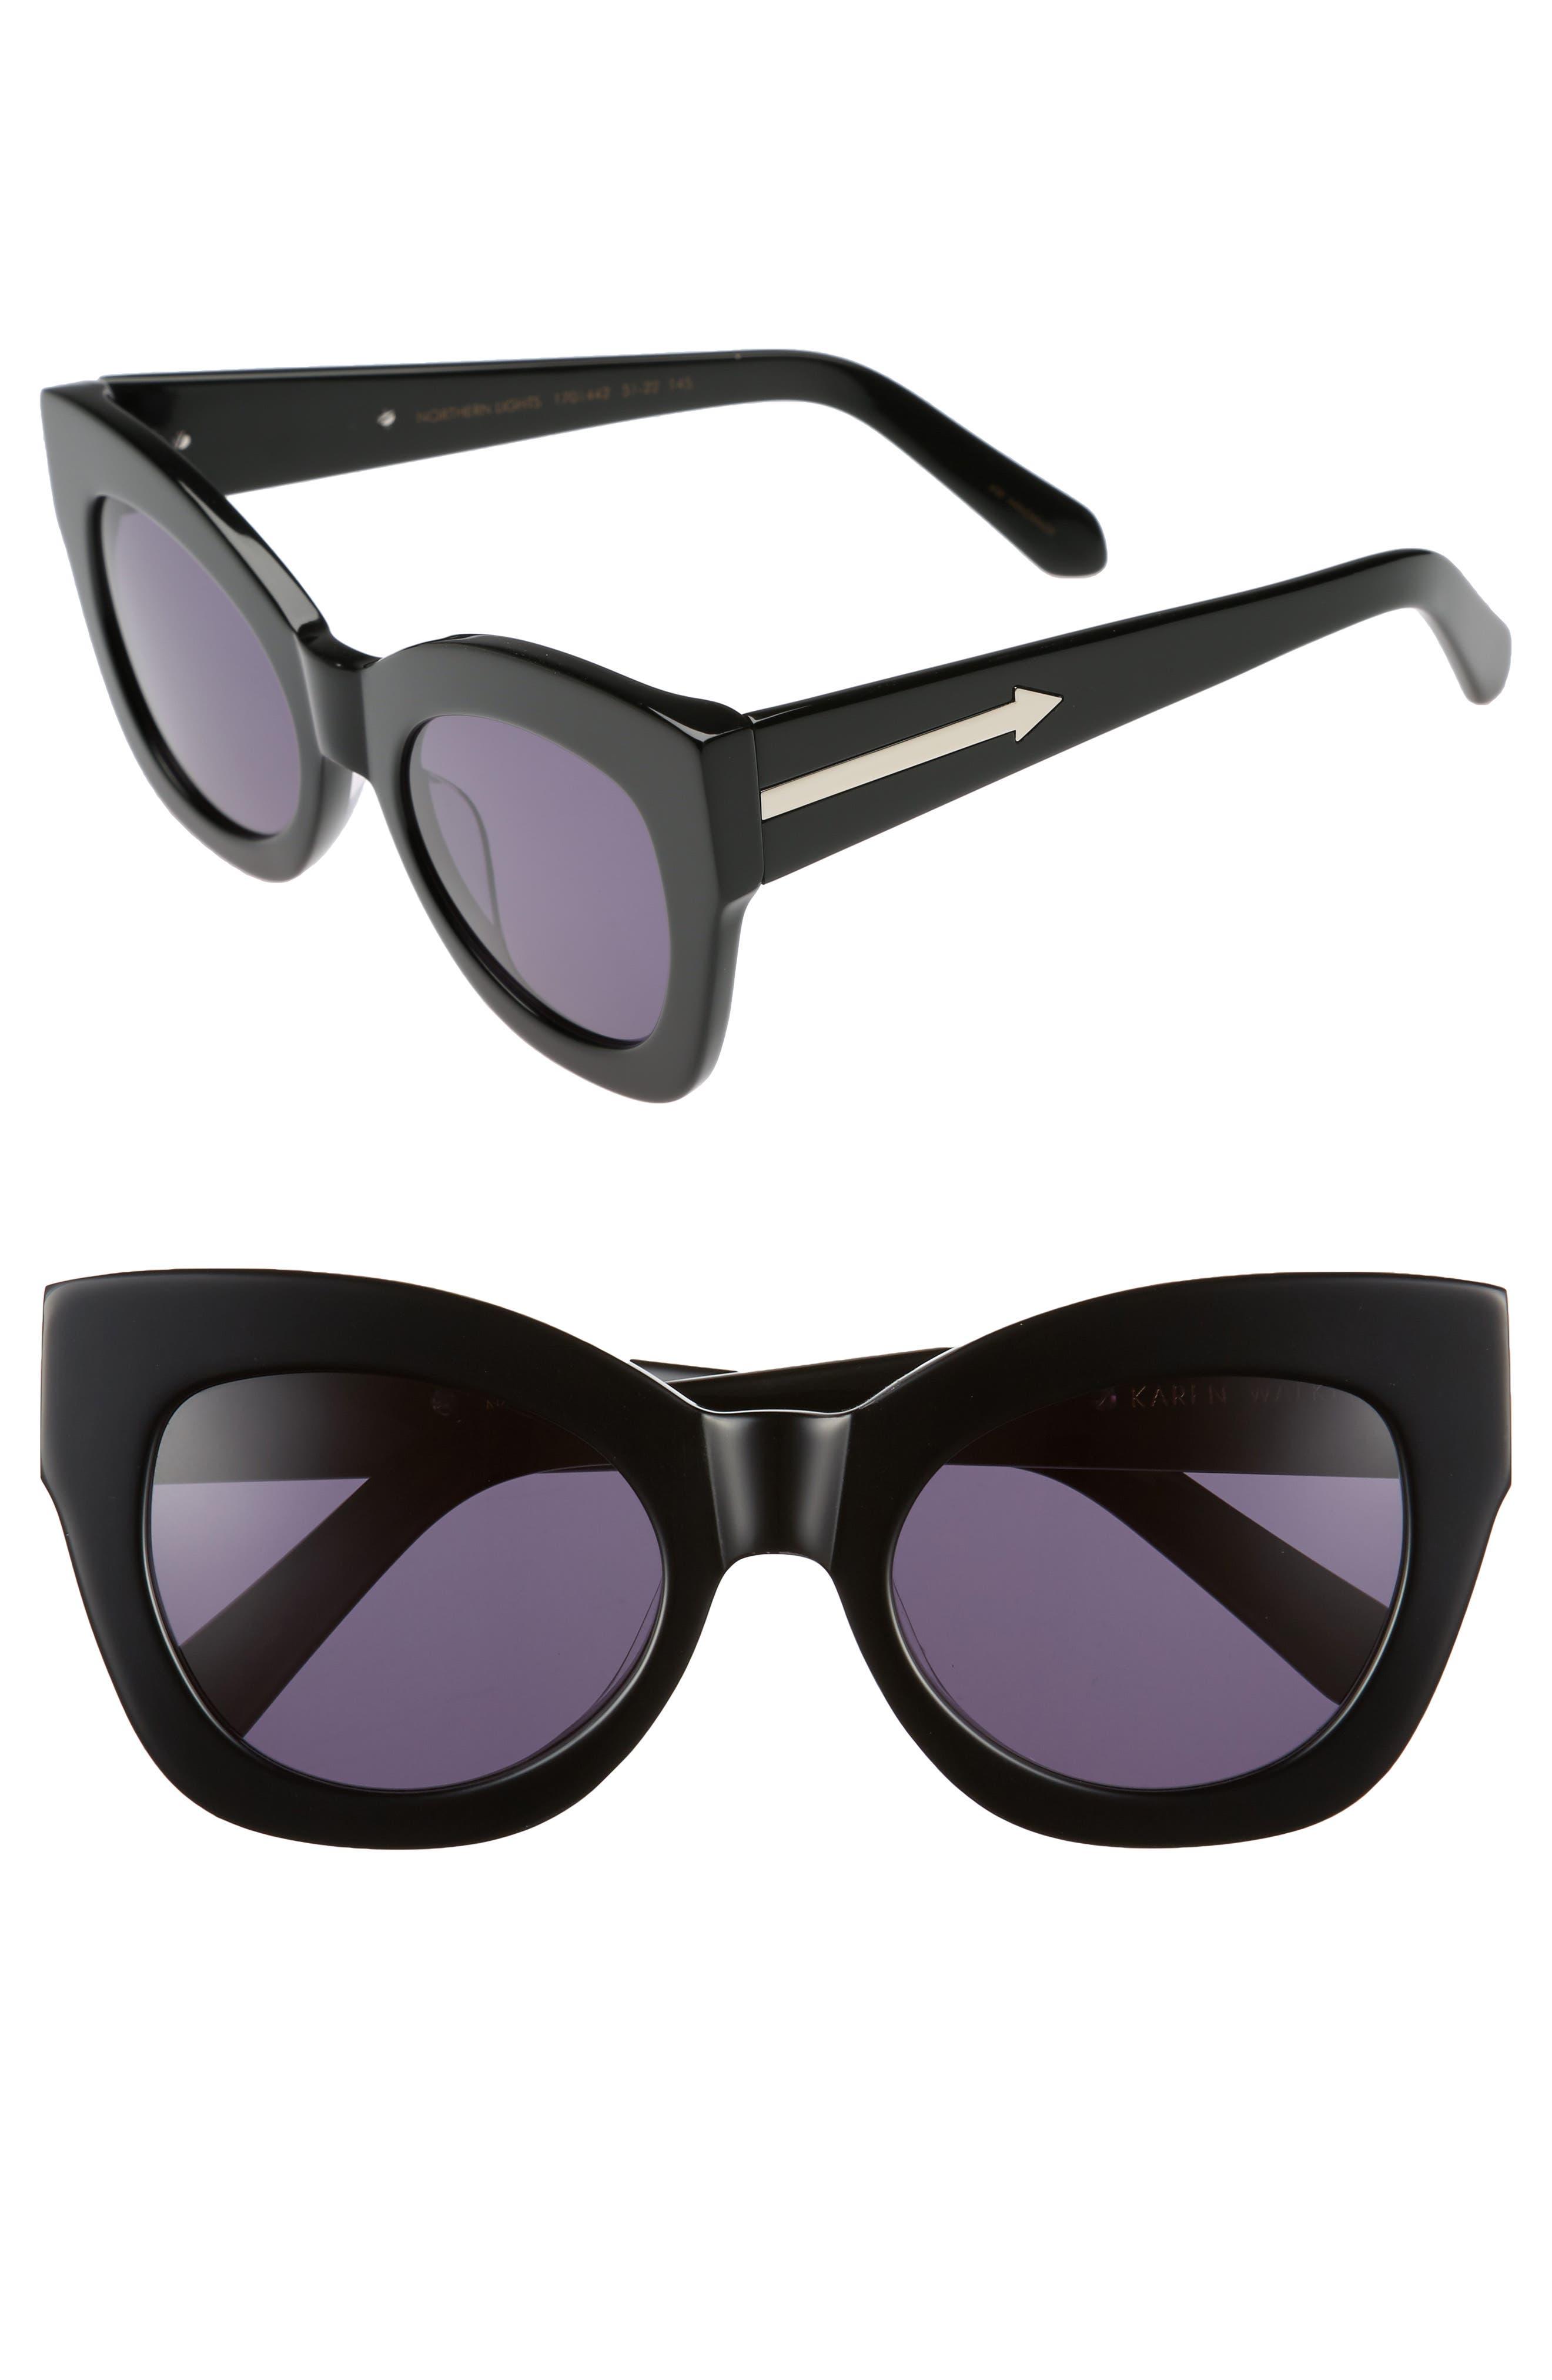 Northern Lights V2 51mm Cat Eye Sunglasses,                             Main thumbnail 1, color,                             001